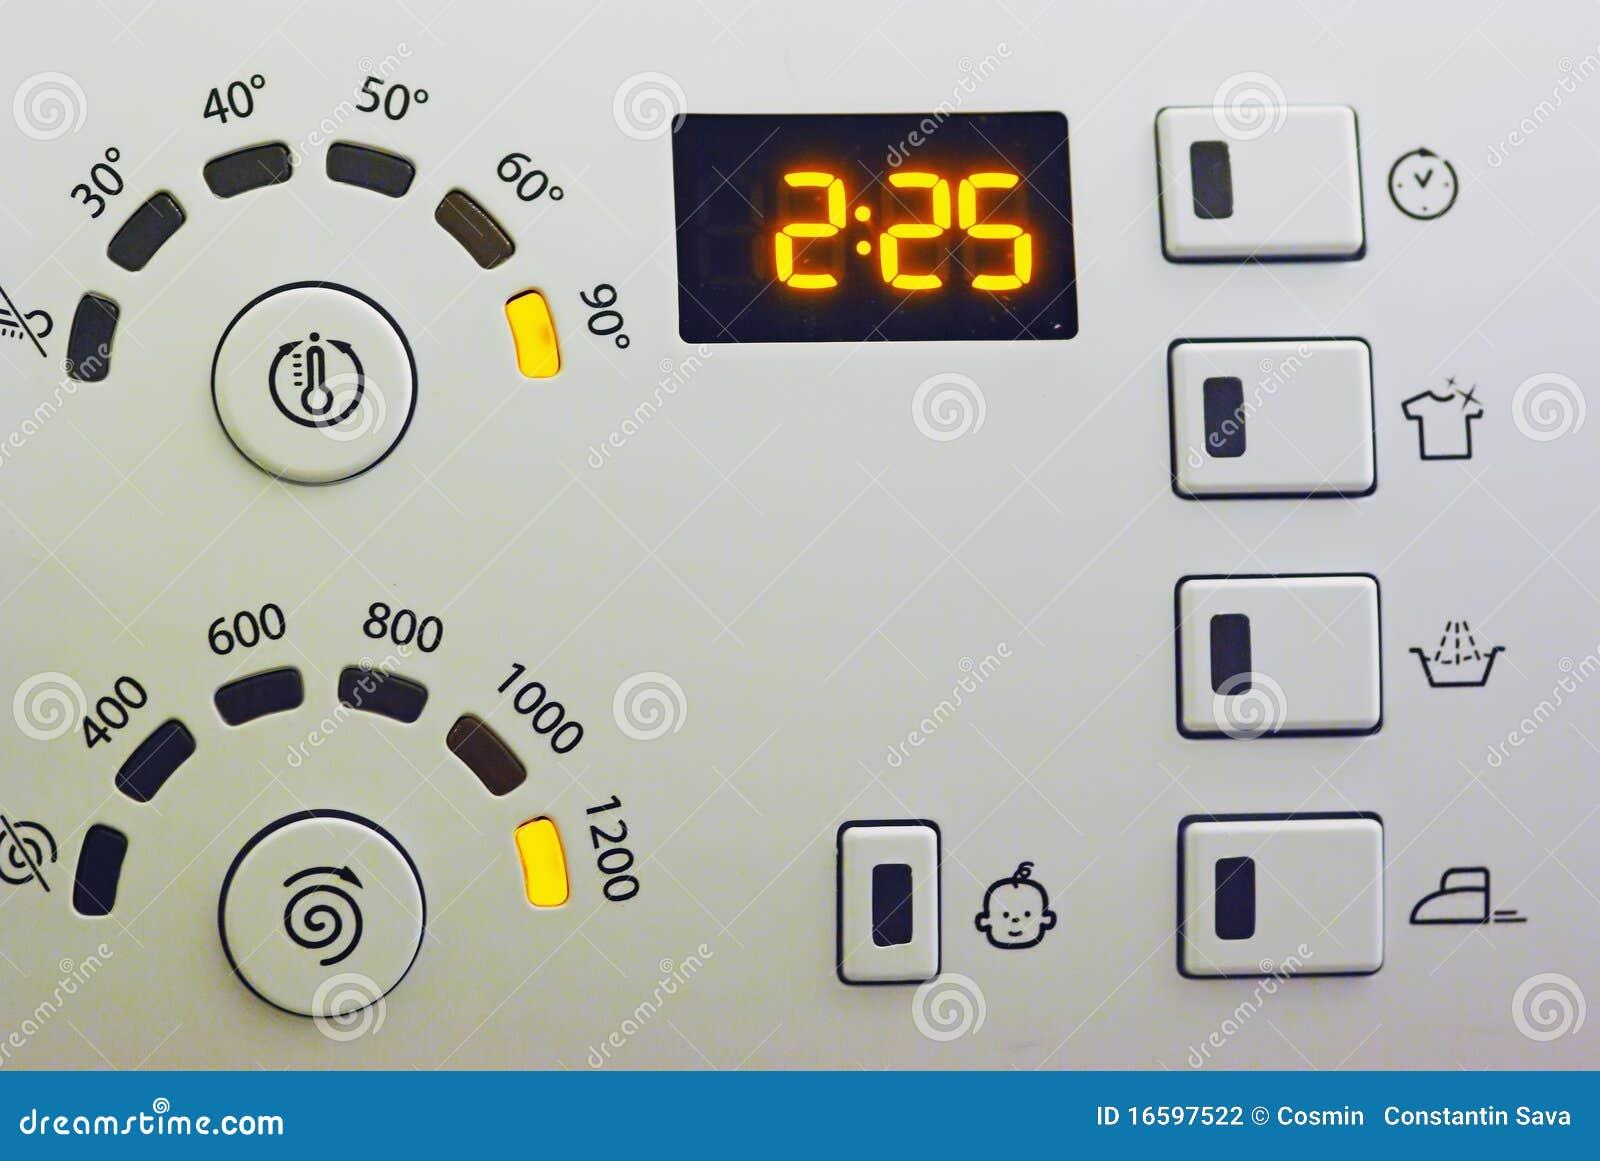 Washing Machine Controls : Washing machine control panel stock photography image